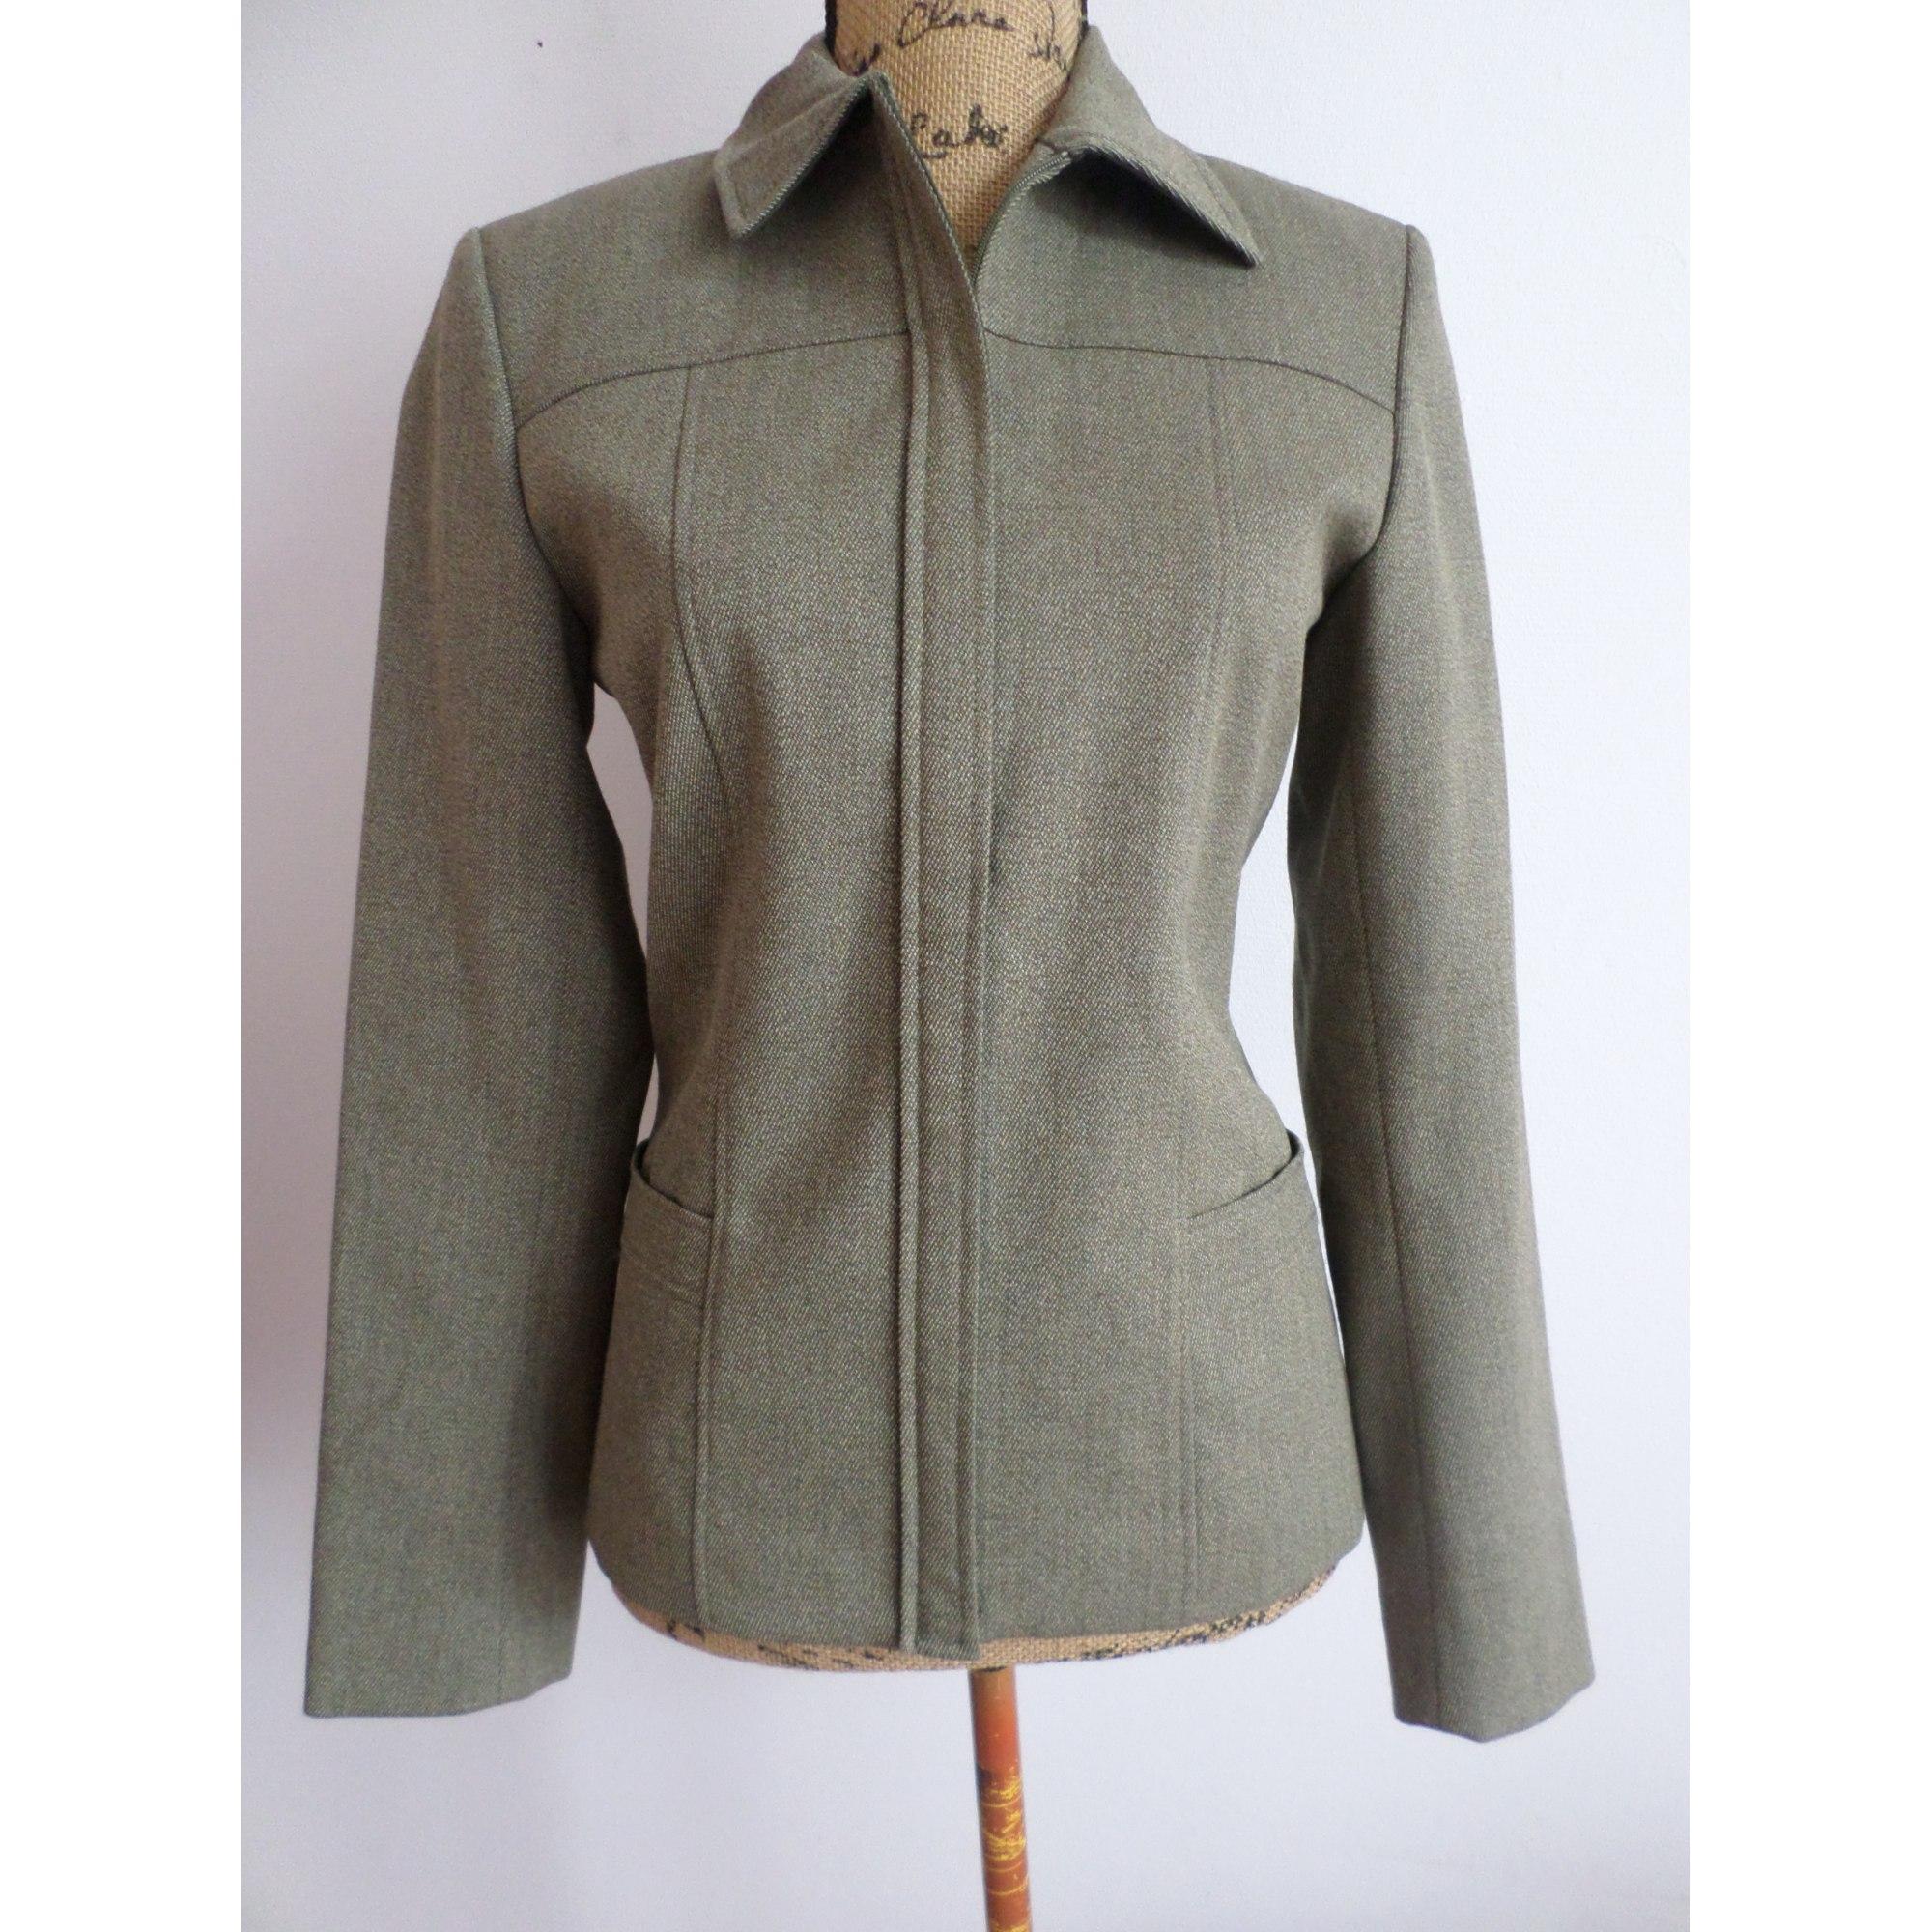 Blazer, veste tailleur CAROLL Vert